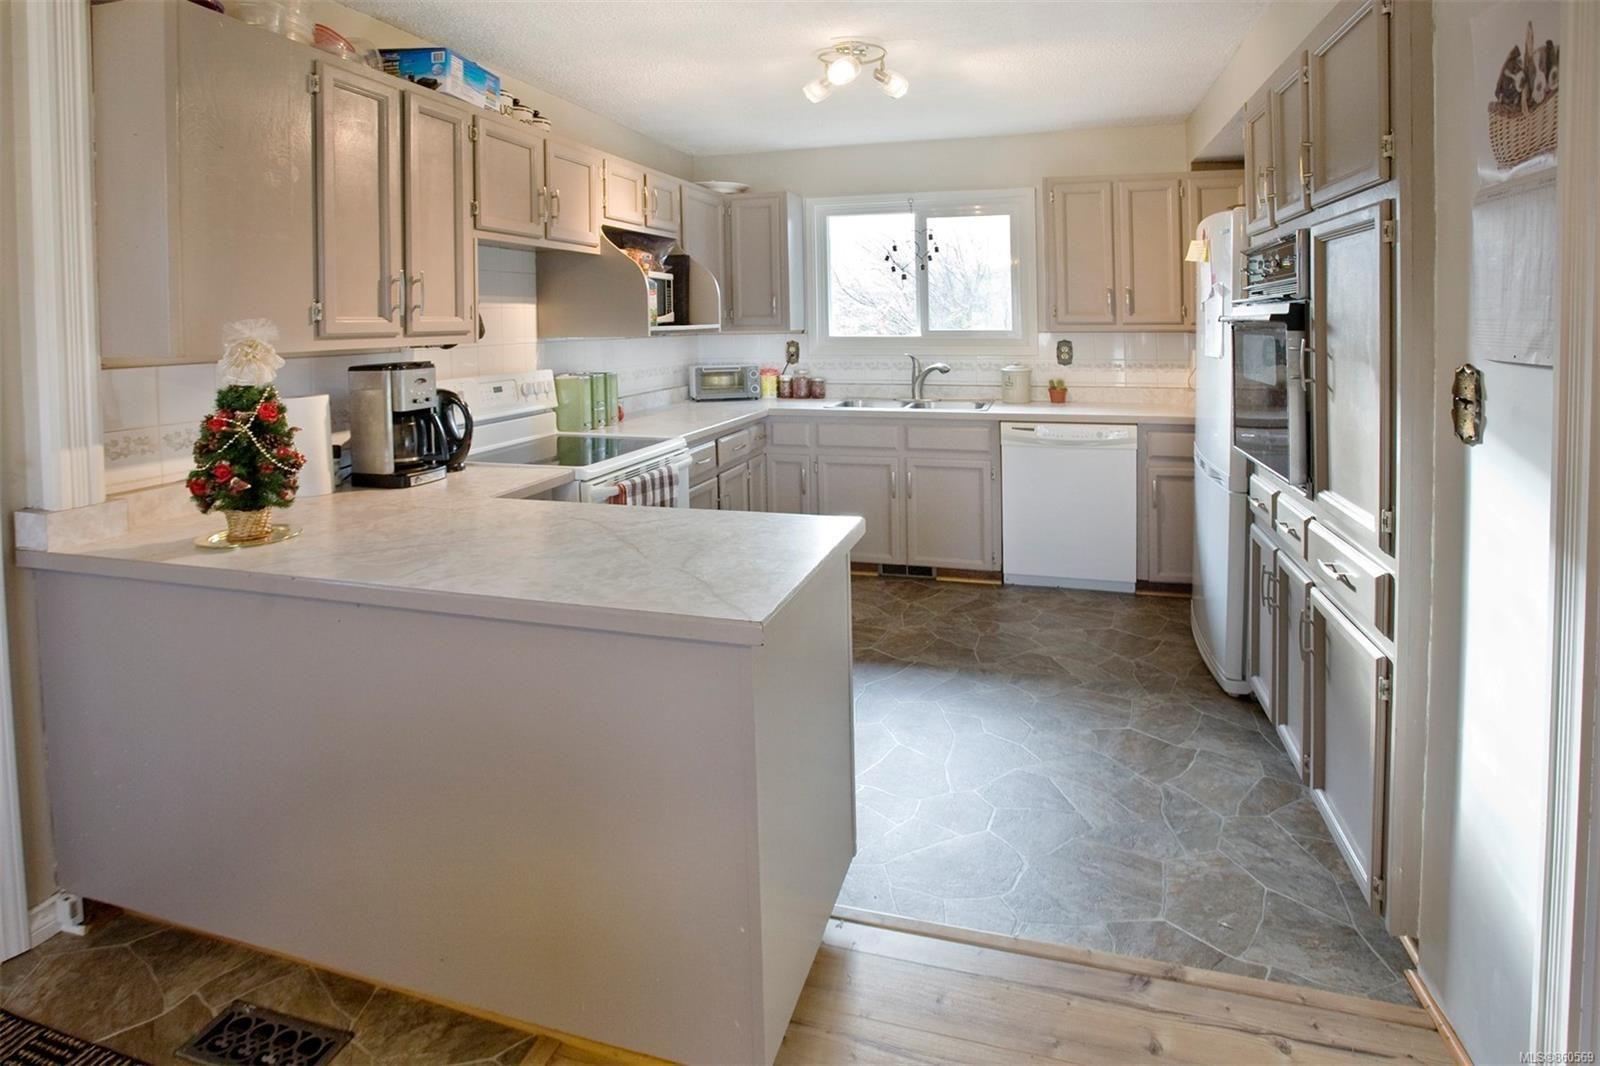 Photo 3: Photos: 4156 Ravenhill Ave in : PA Port Alberni House for sale (Port Alberni)  : MLS®# 860569